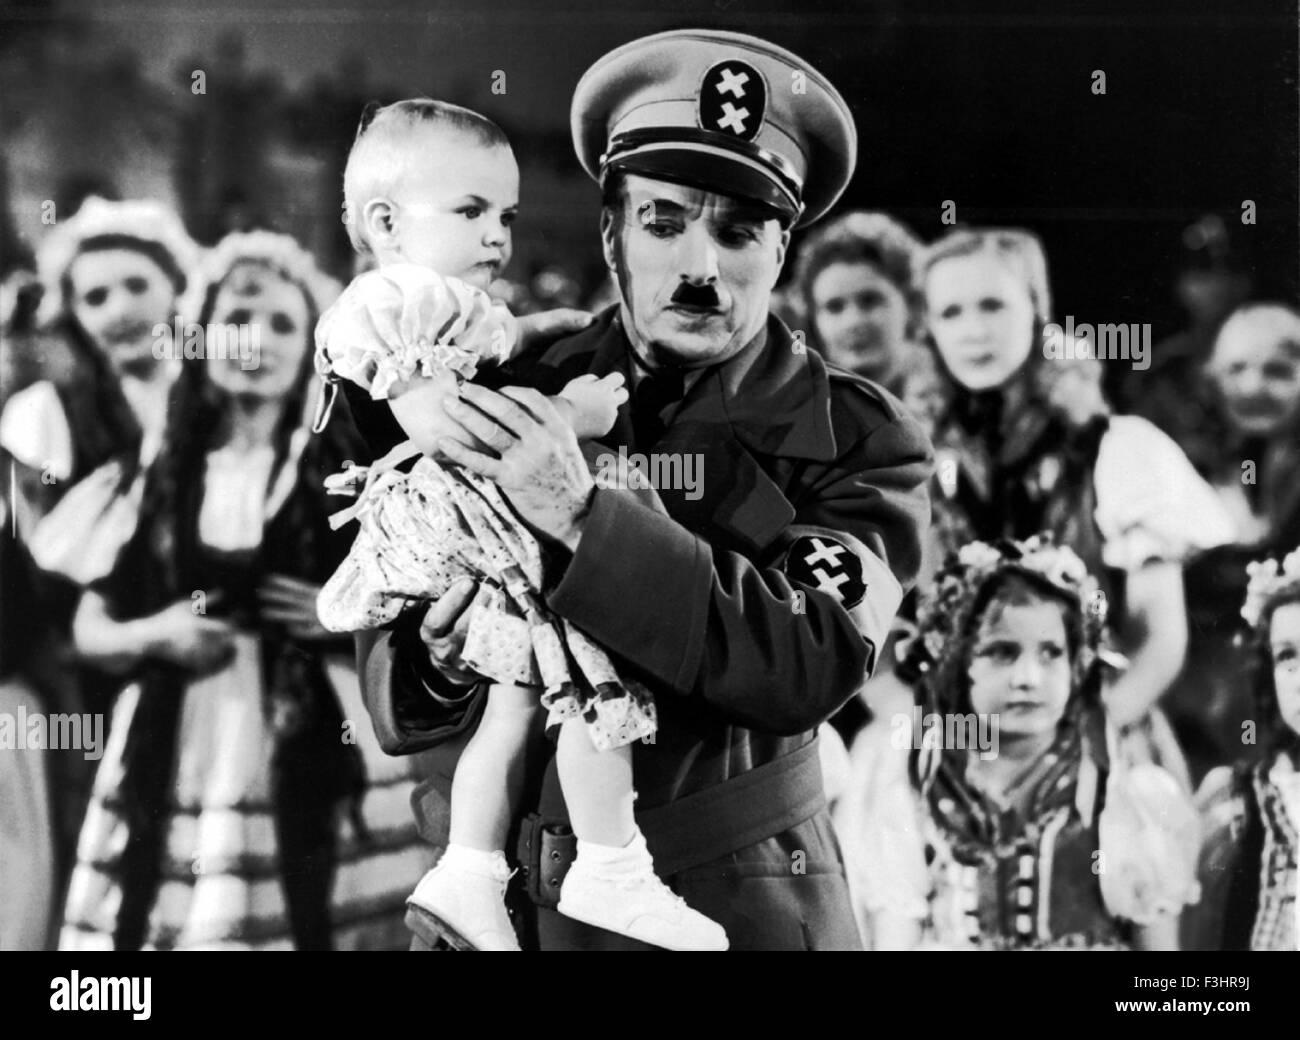 the great dictator satire